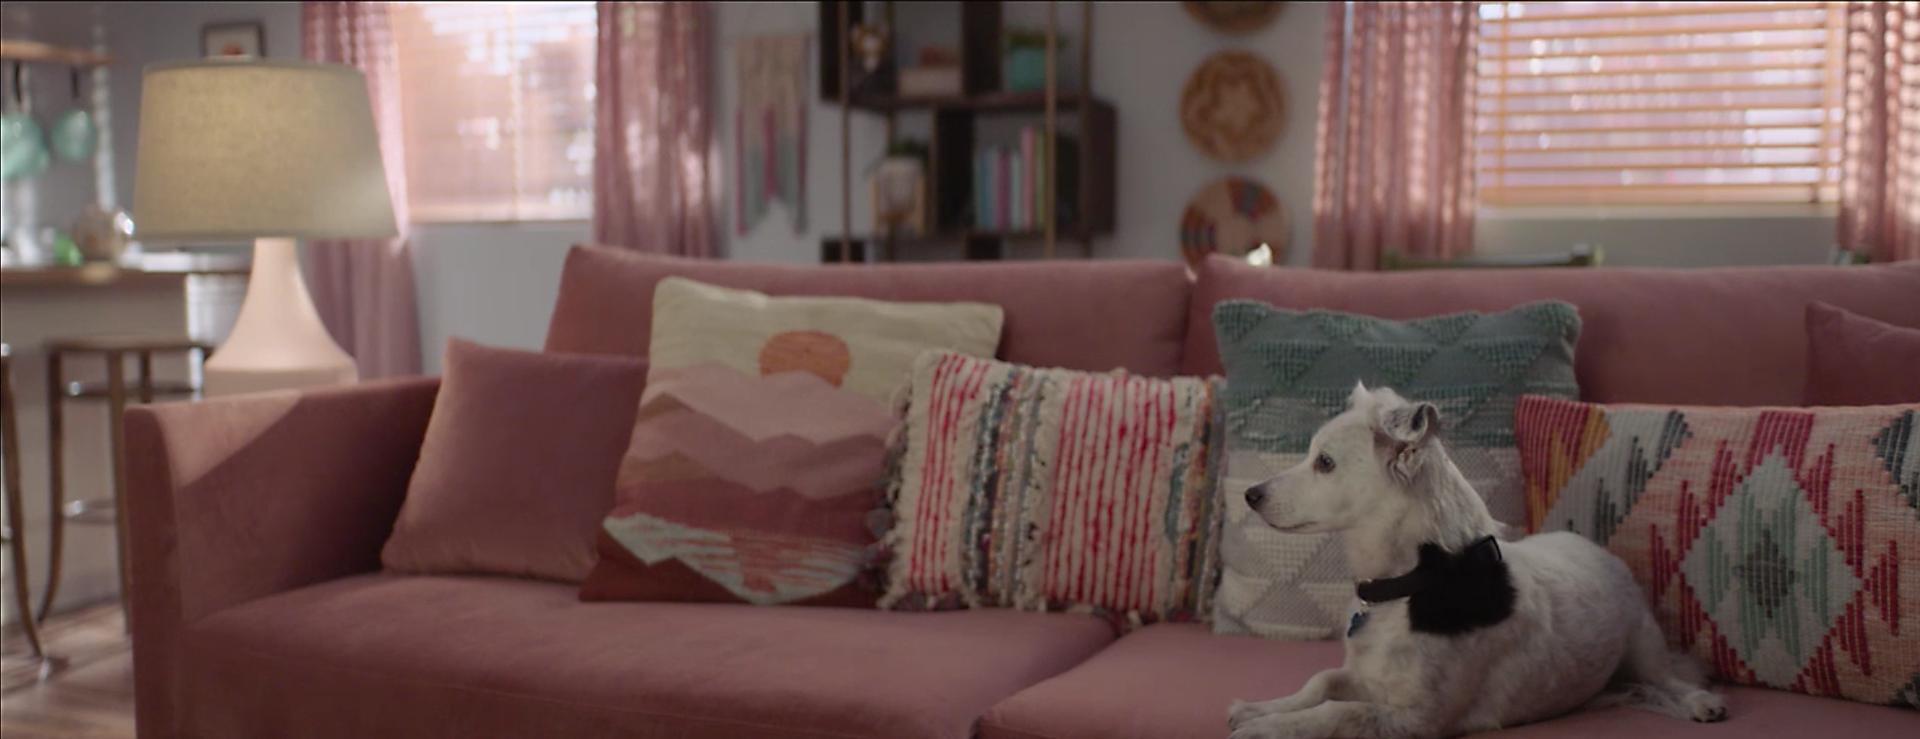 dog living room copy.png